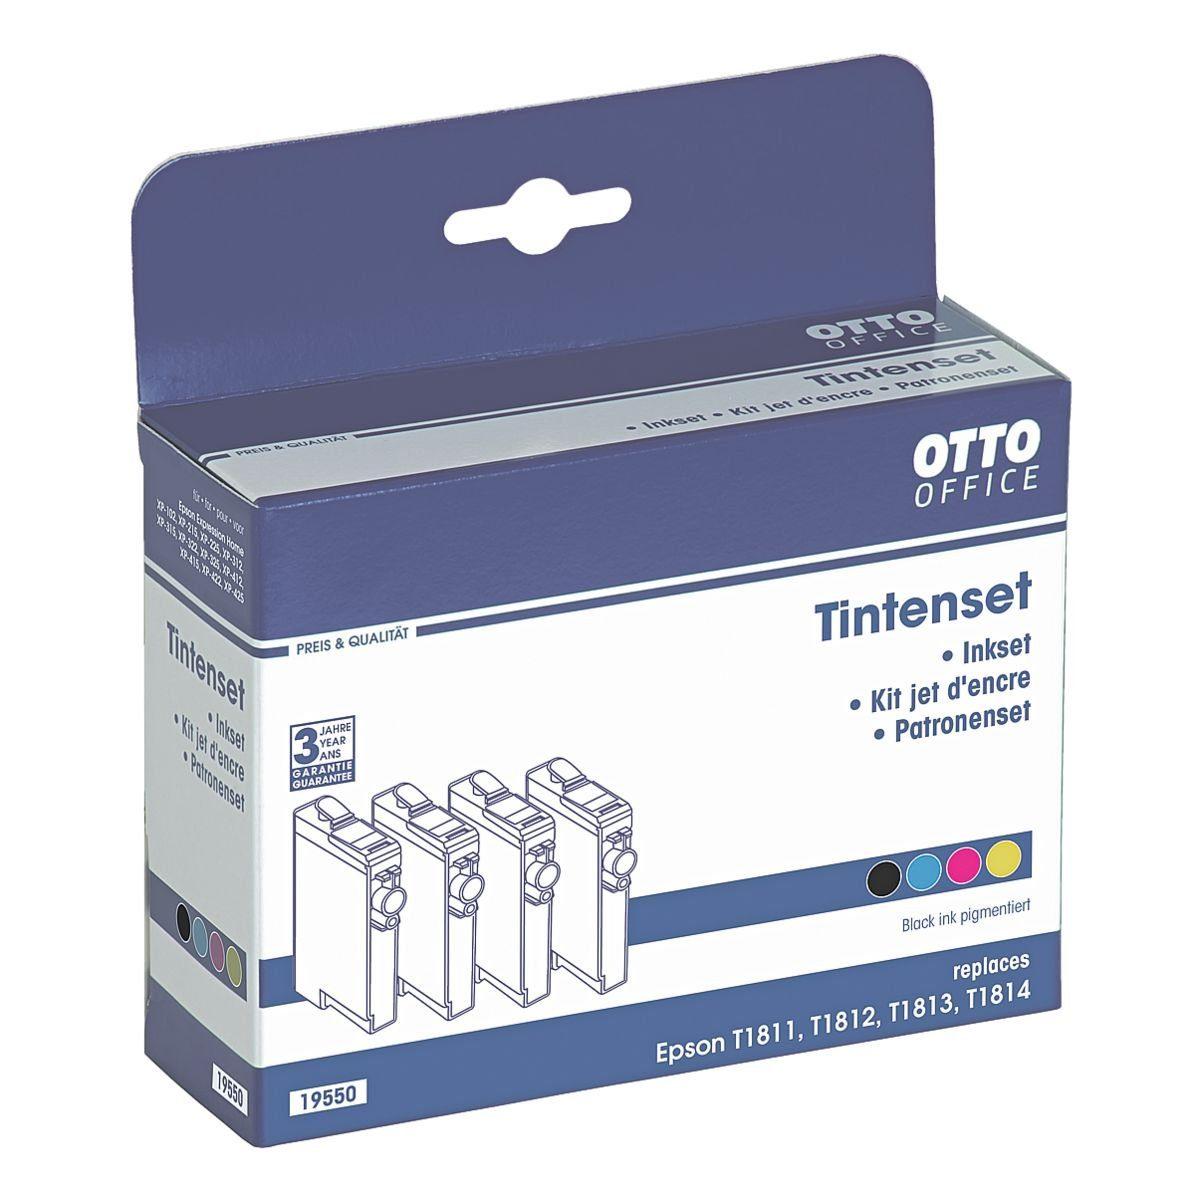 OTTO Office Standard Tintenpatrone ersetzt Epson »T1816XL«